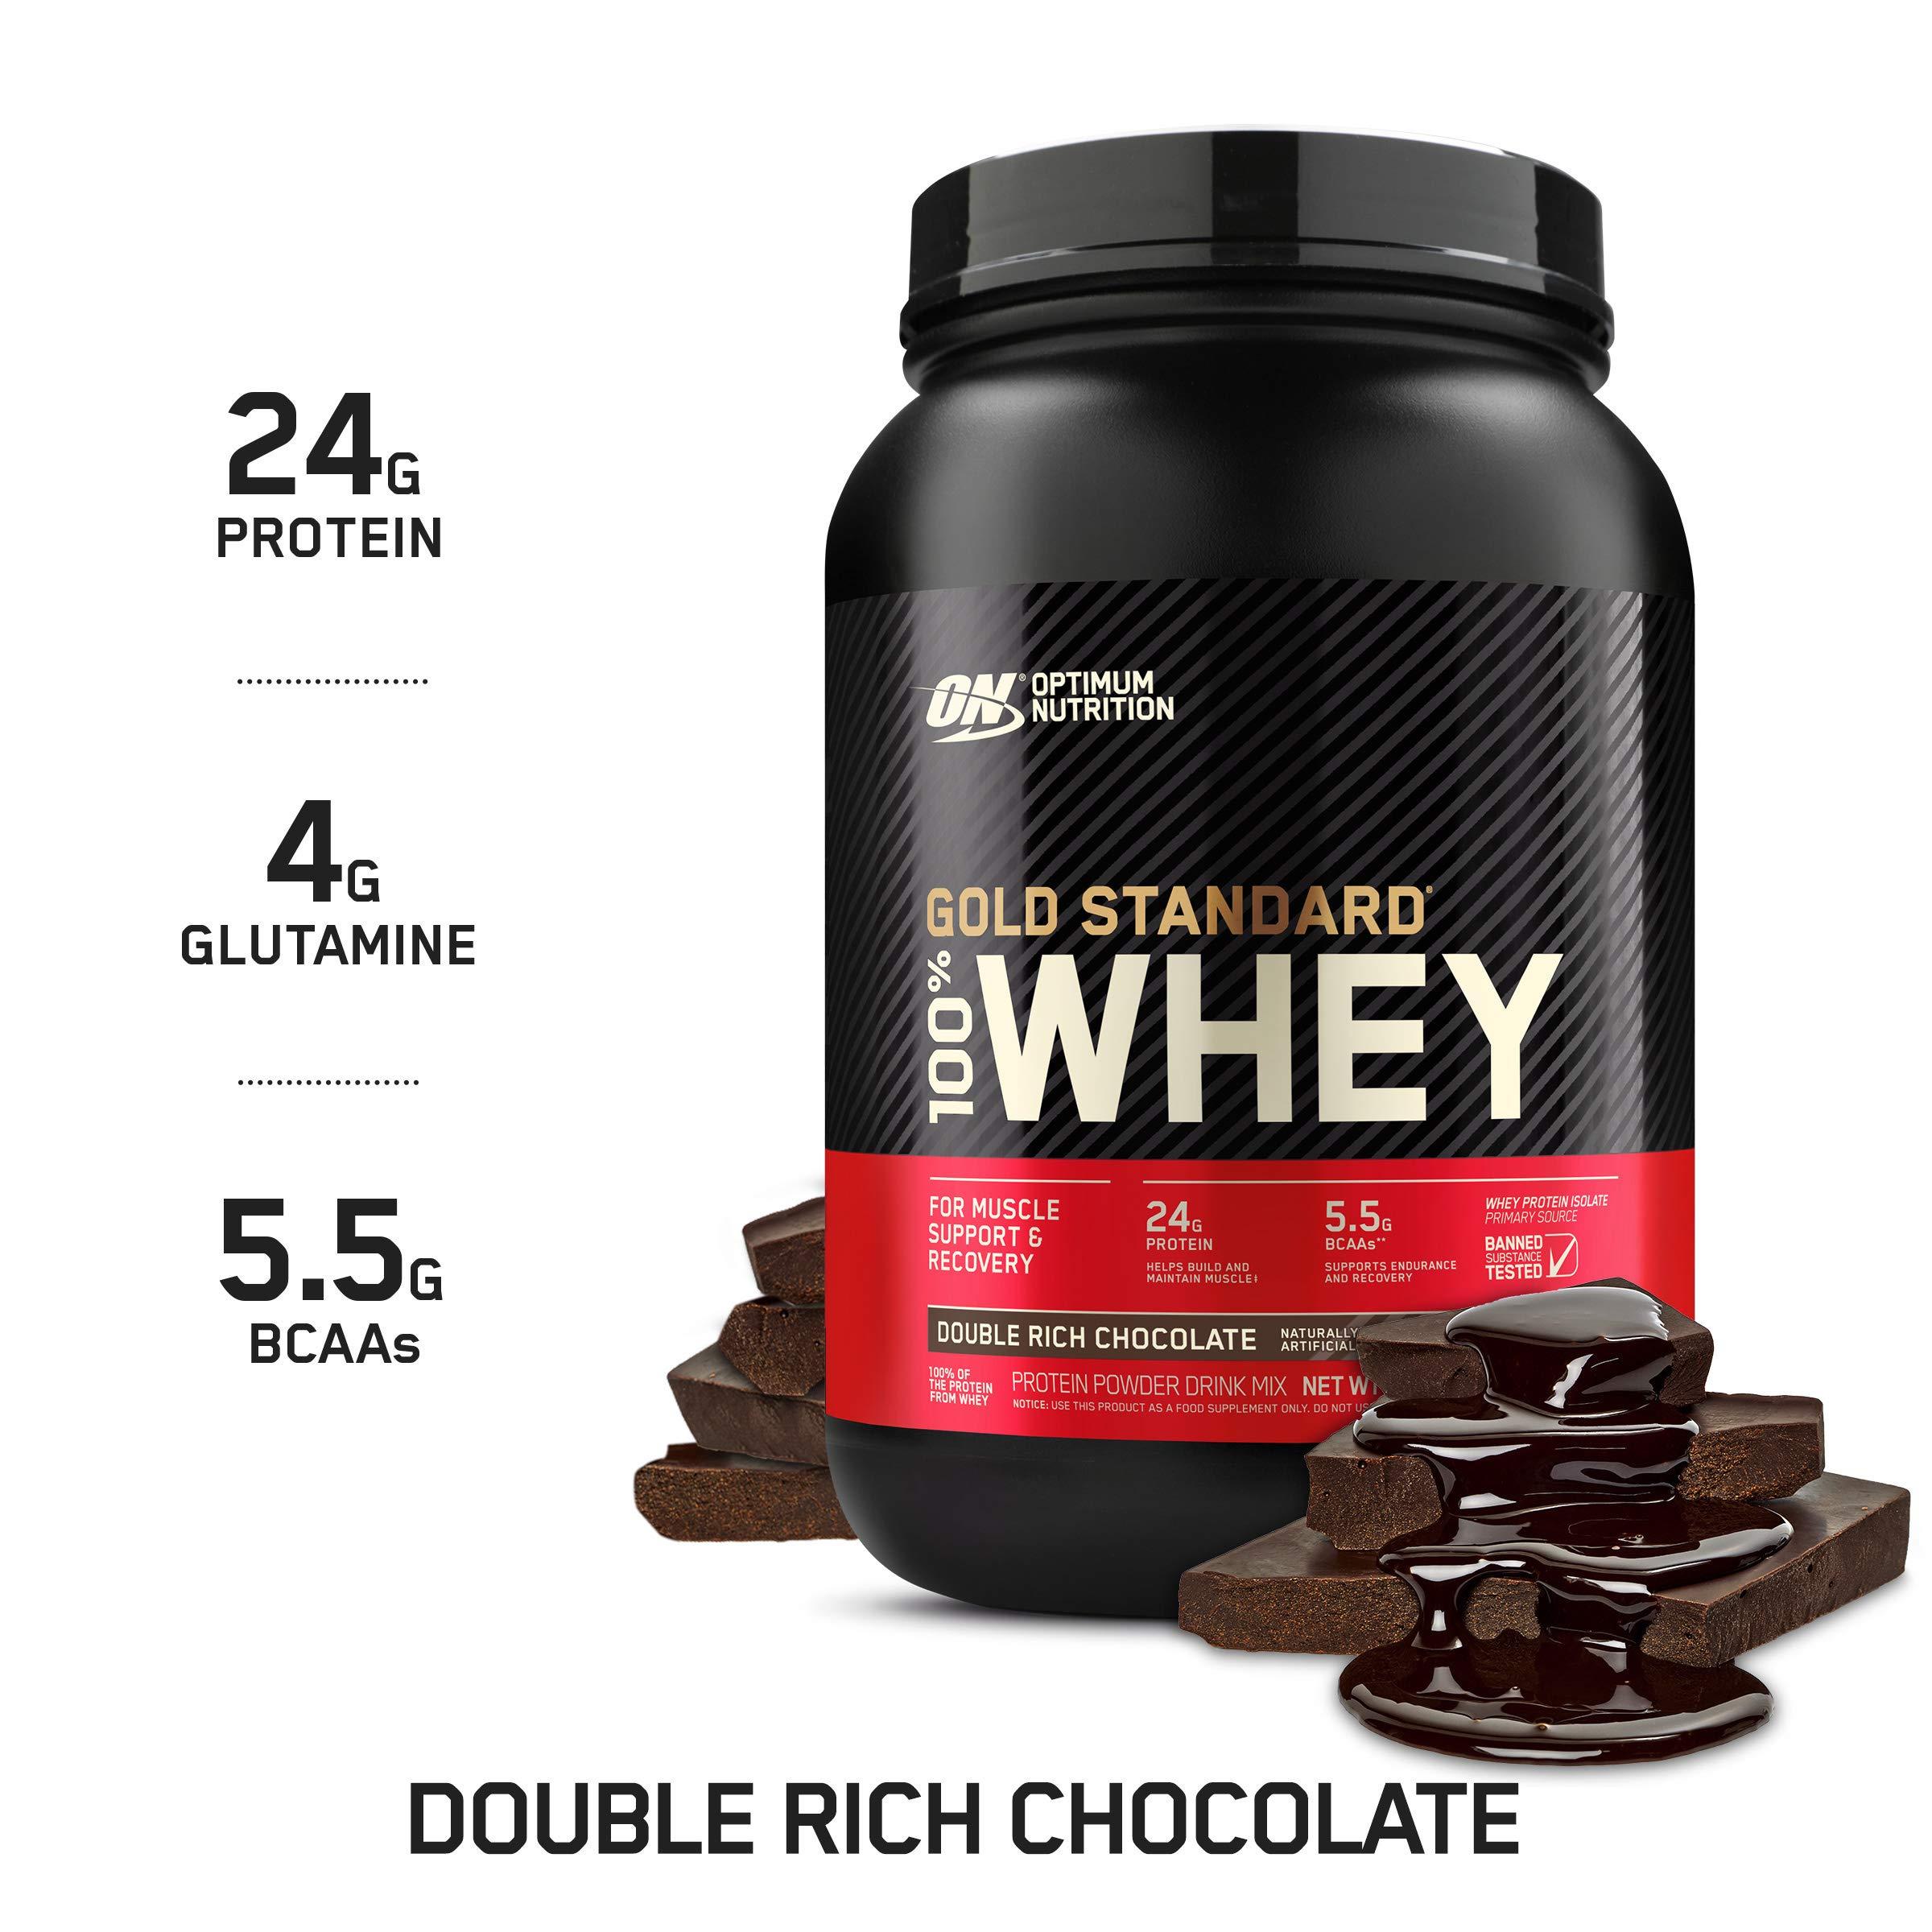 OPTIMUM NUTRITION STANDARD Protein Chocolate